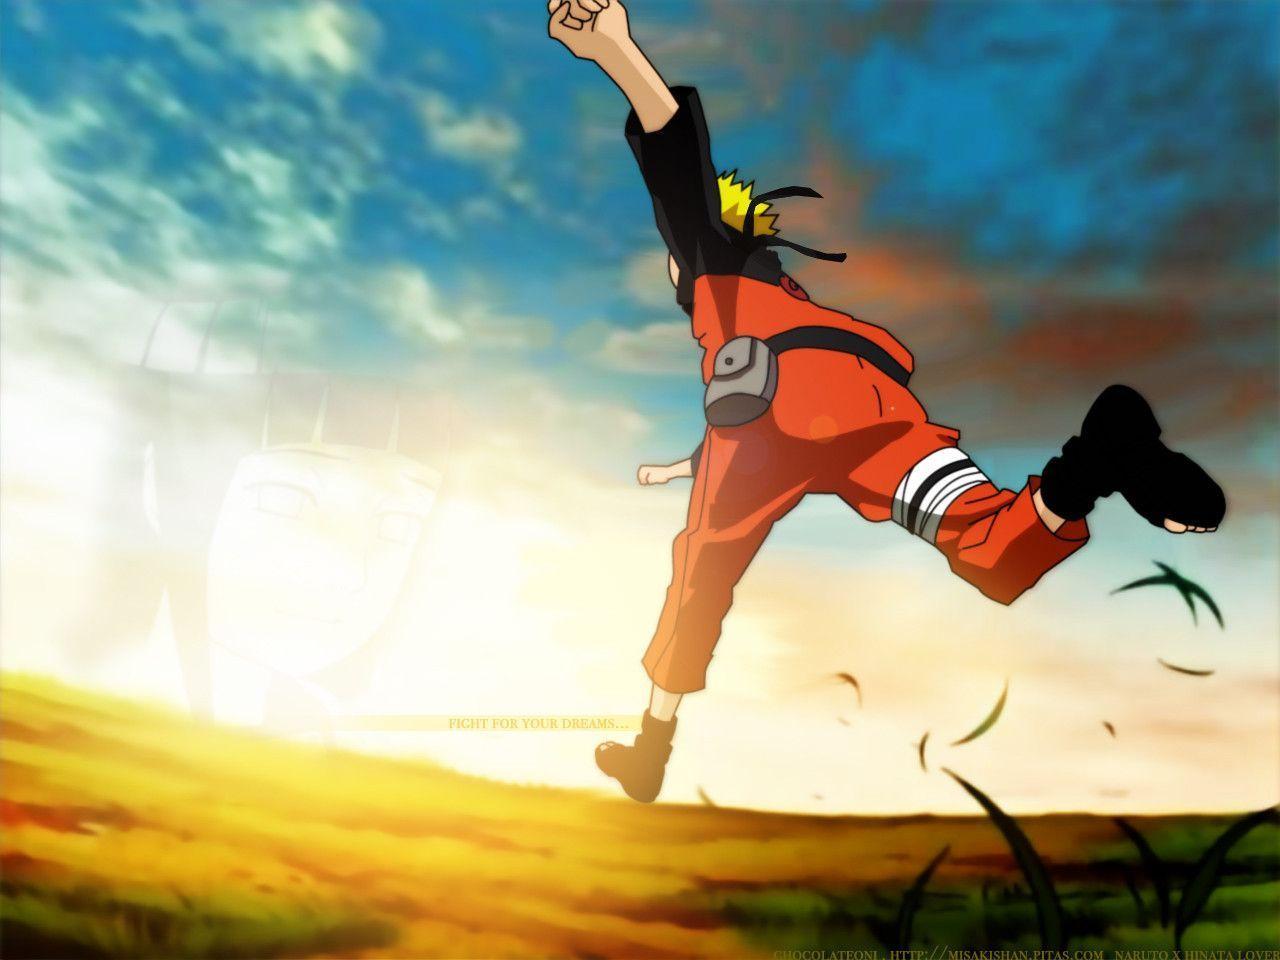 Download Free Naruto Wallpaper 1280x960 | Full HD Wallpapers